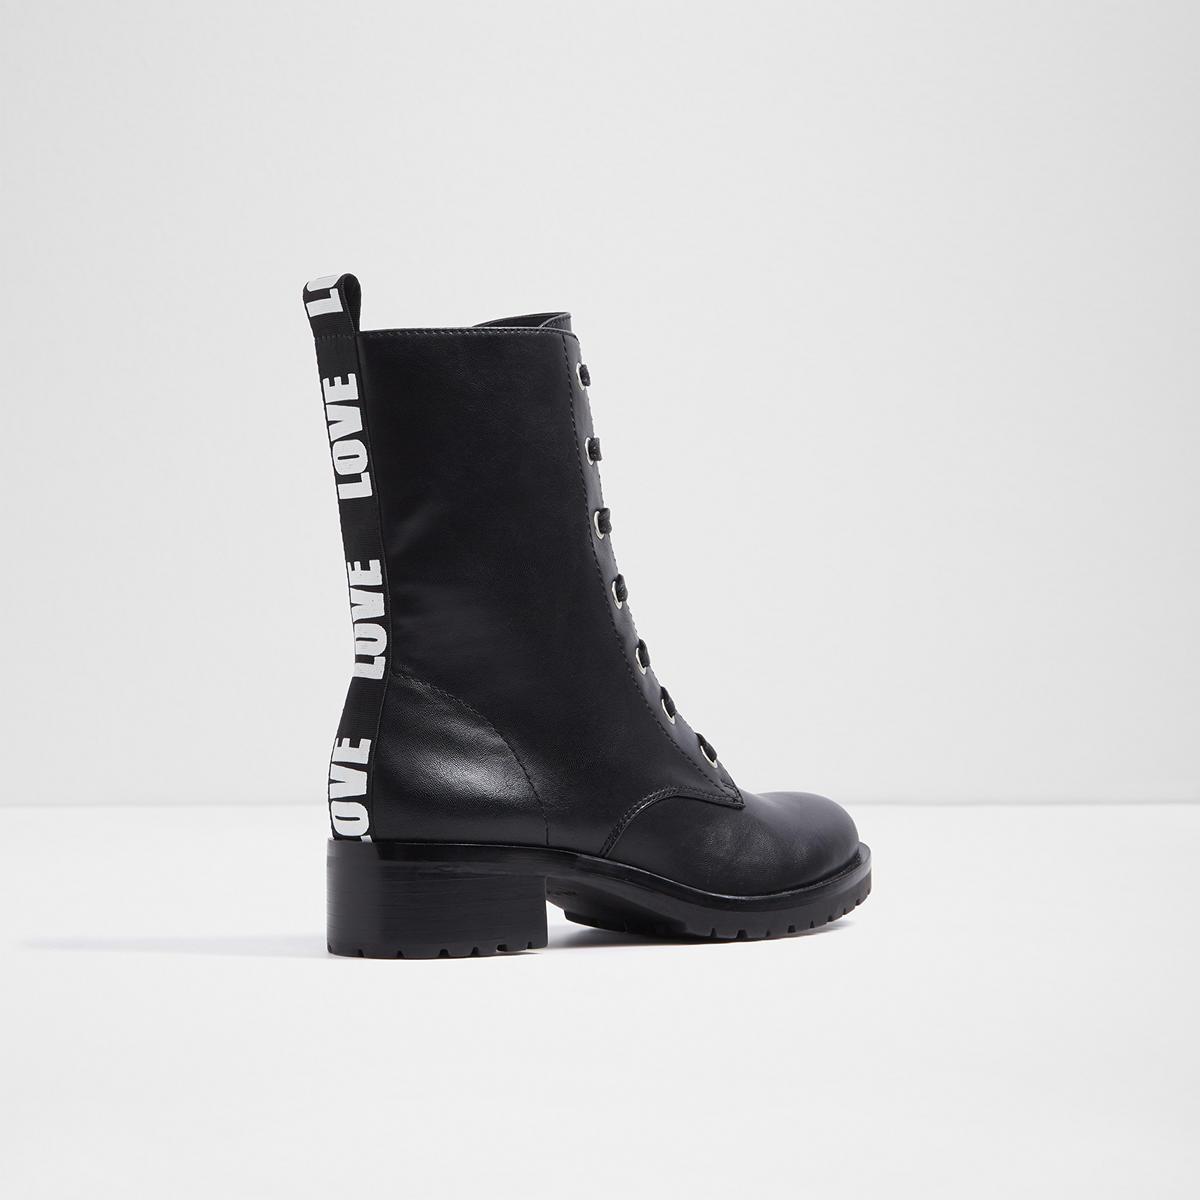 big sale 15169 60cbd Womens Boots Us Ankle Black Trulle aqp58R